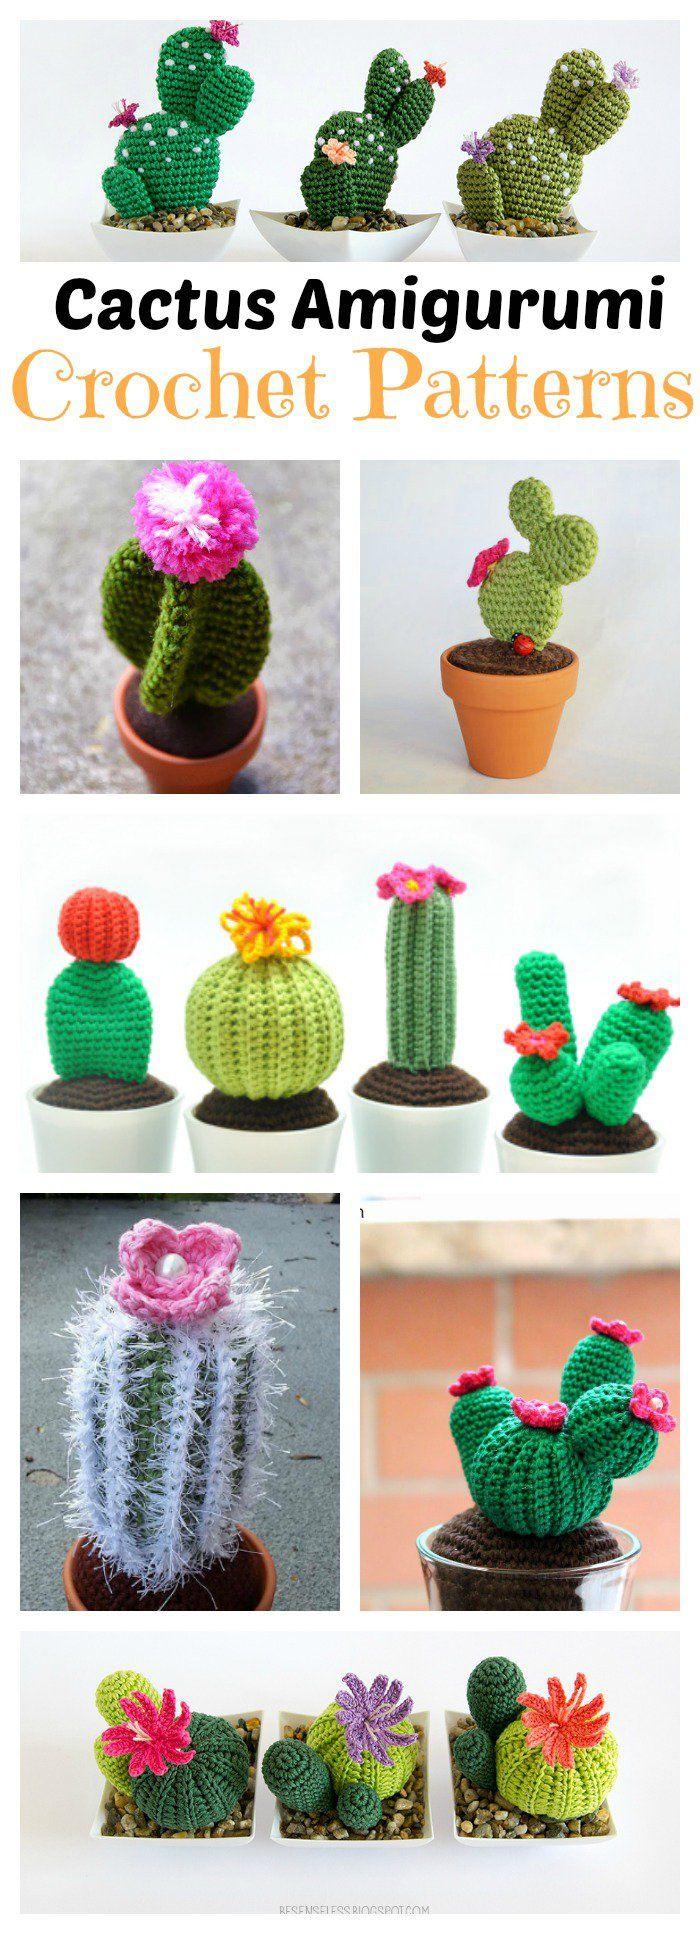 Amigurumi Cactus And Flower Crochet Pattern : 17 Best ideas about Amigurumi on Pinterest Crochet ...